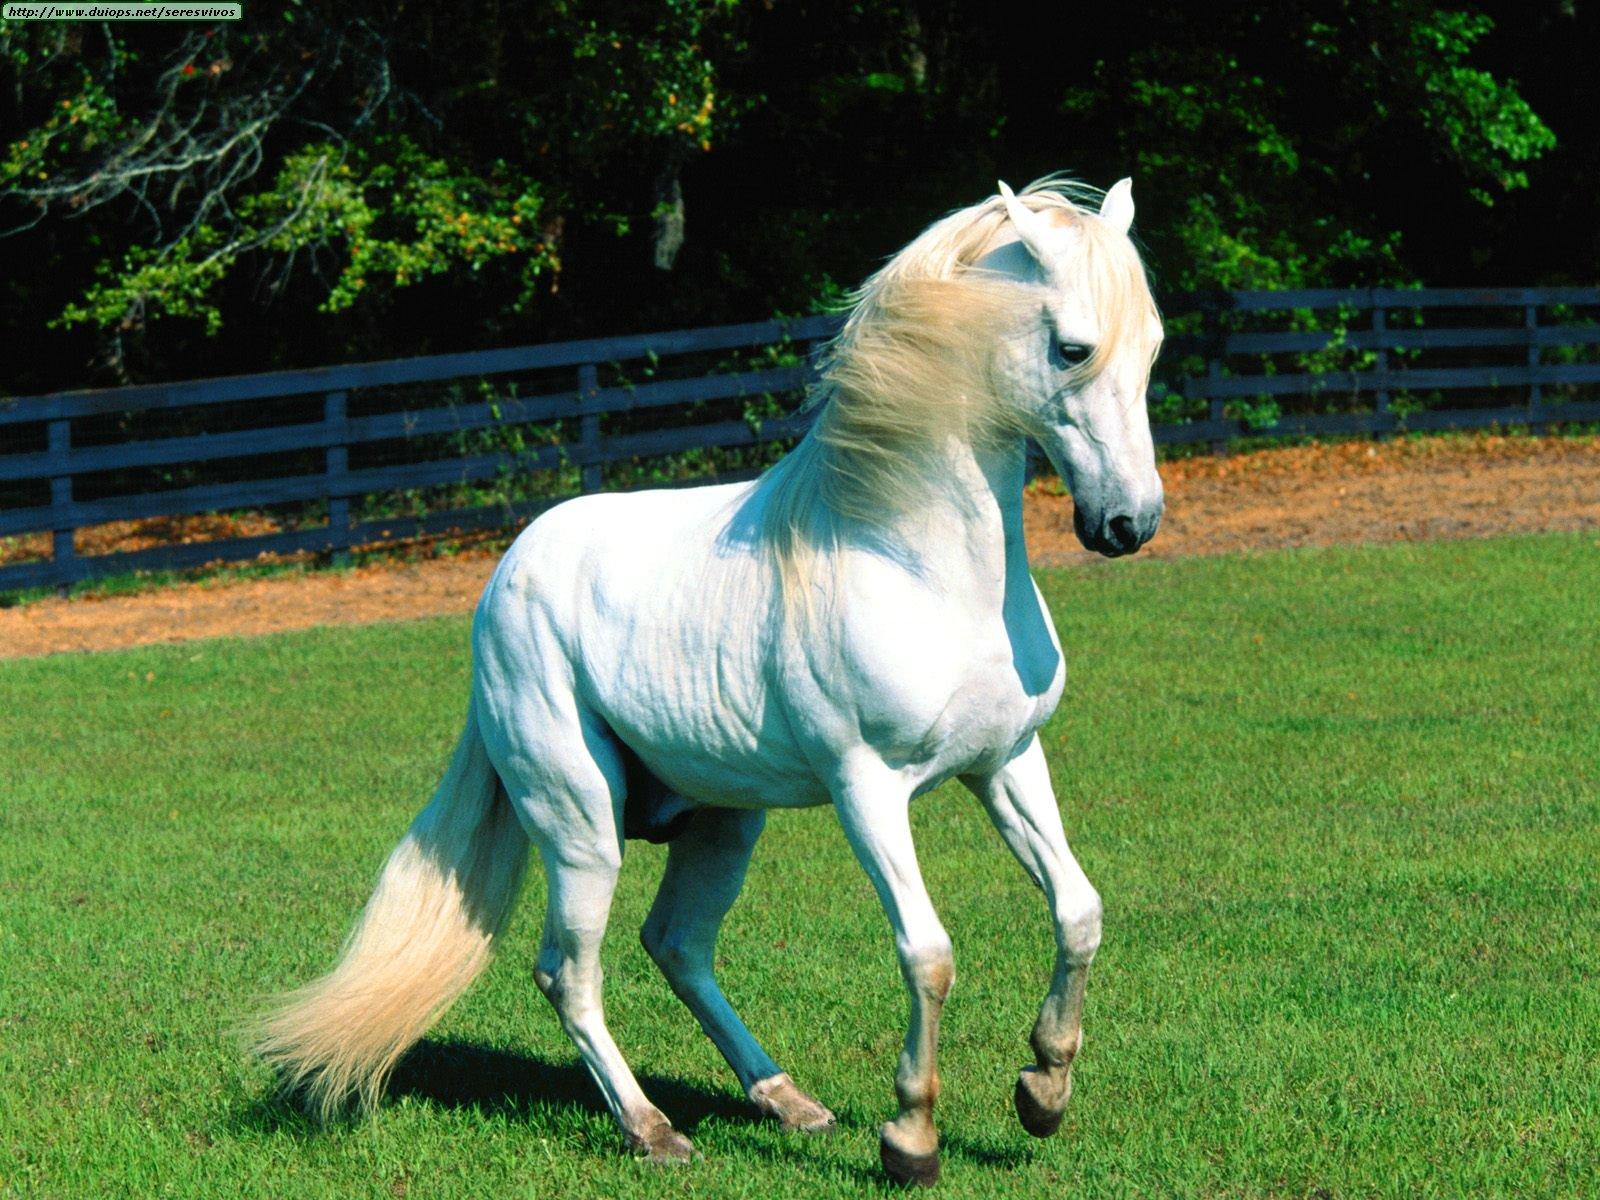 http://www.duiops.net/seresvivos/galeria/caballos/Animals%20Horses_%20El%20Murie%20,%20Paso%20Fino.jpg